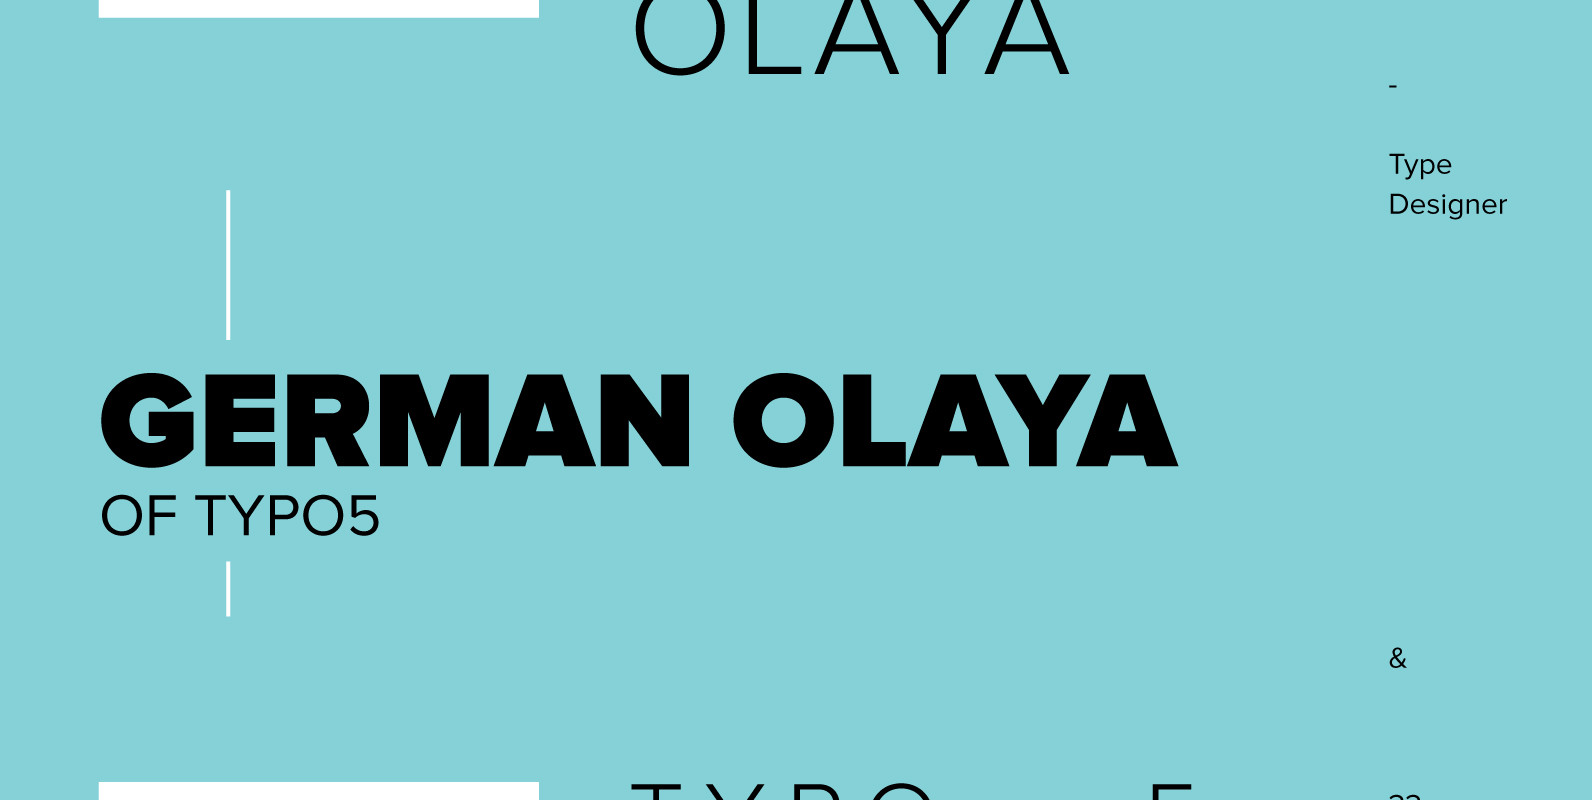 German Olaya of Typo5